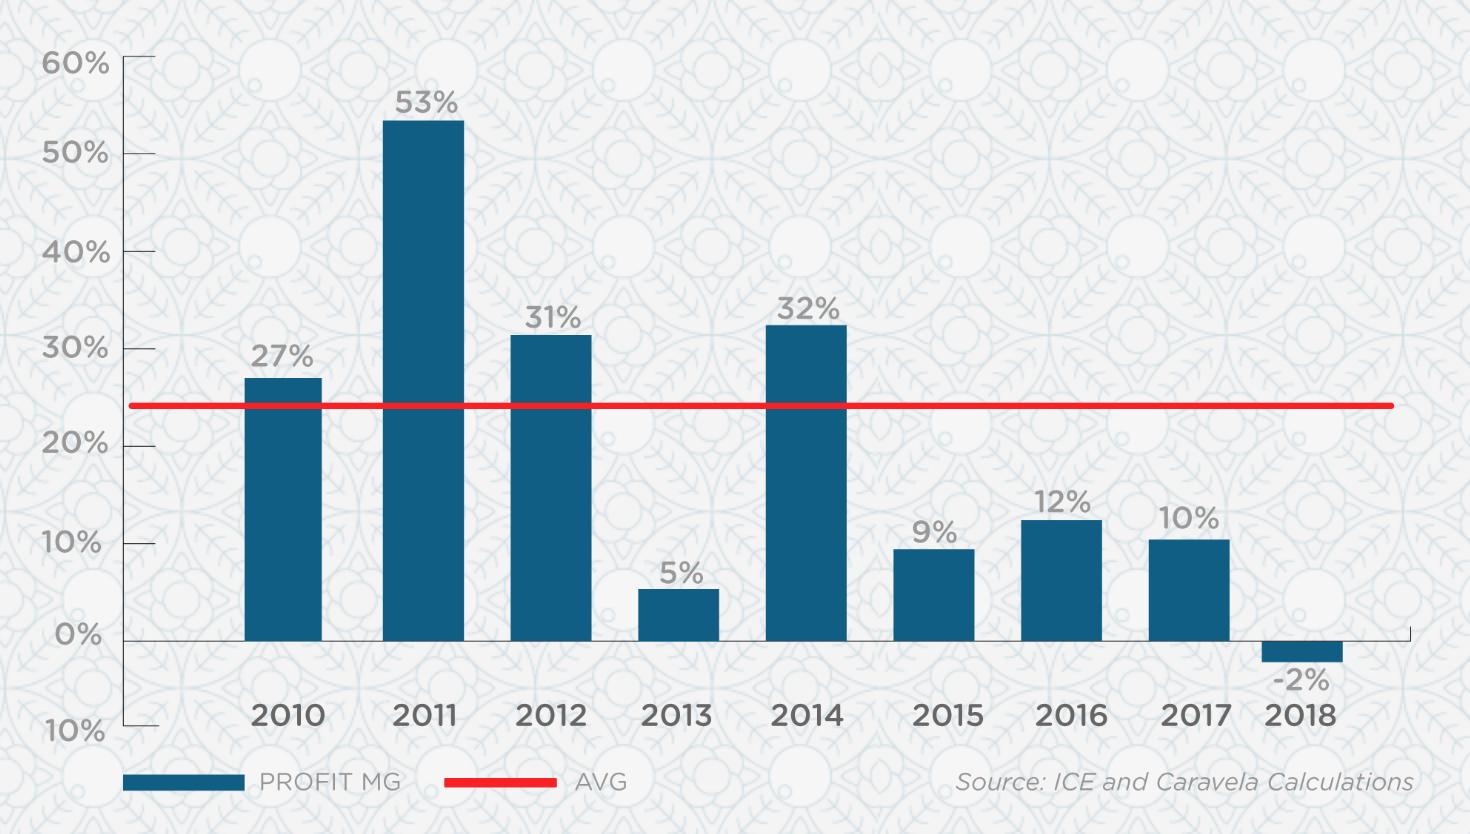 profit margin 2010-2018